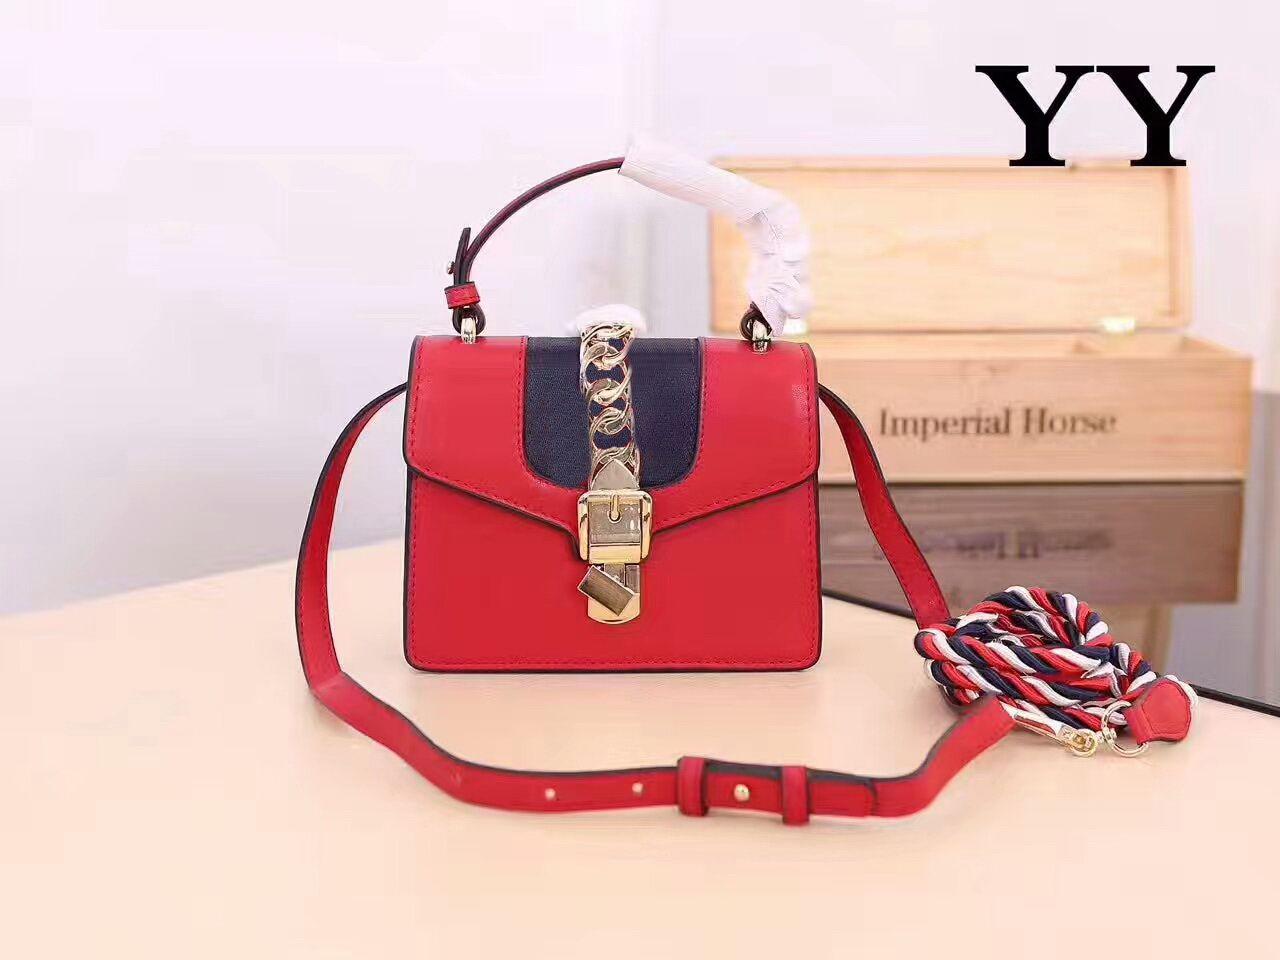 High Quality Fashion 20cm Mini Women Brand Sylvie Leather Boston Bags  Handbag Straps Shoulder Bags Totes Cross Body Purse Cheap Designer Handbags  Black ... 4307afc740168